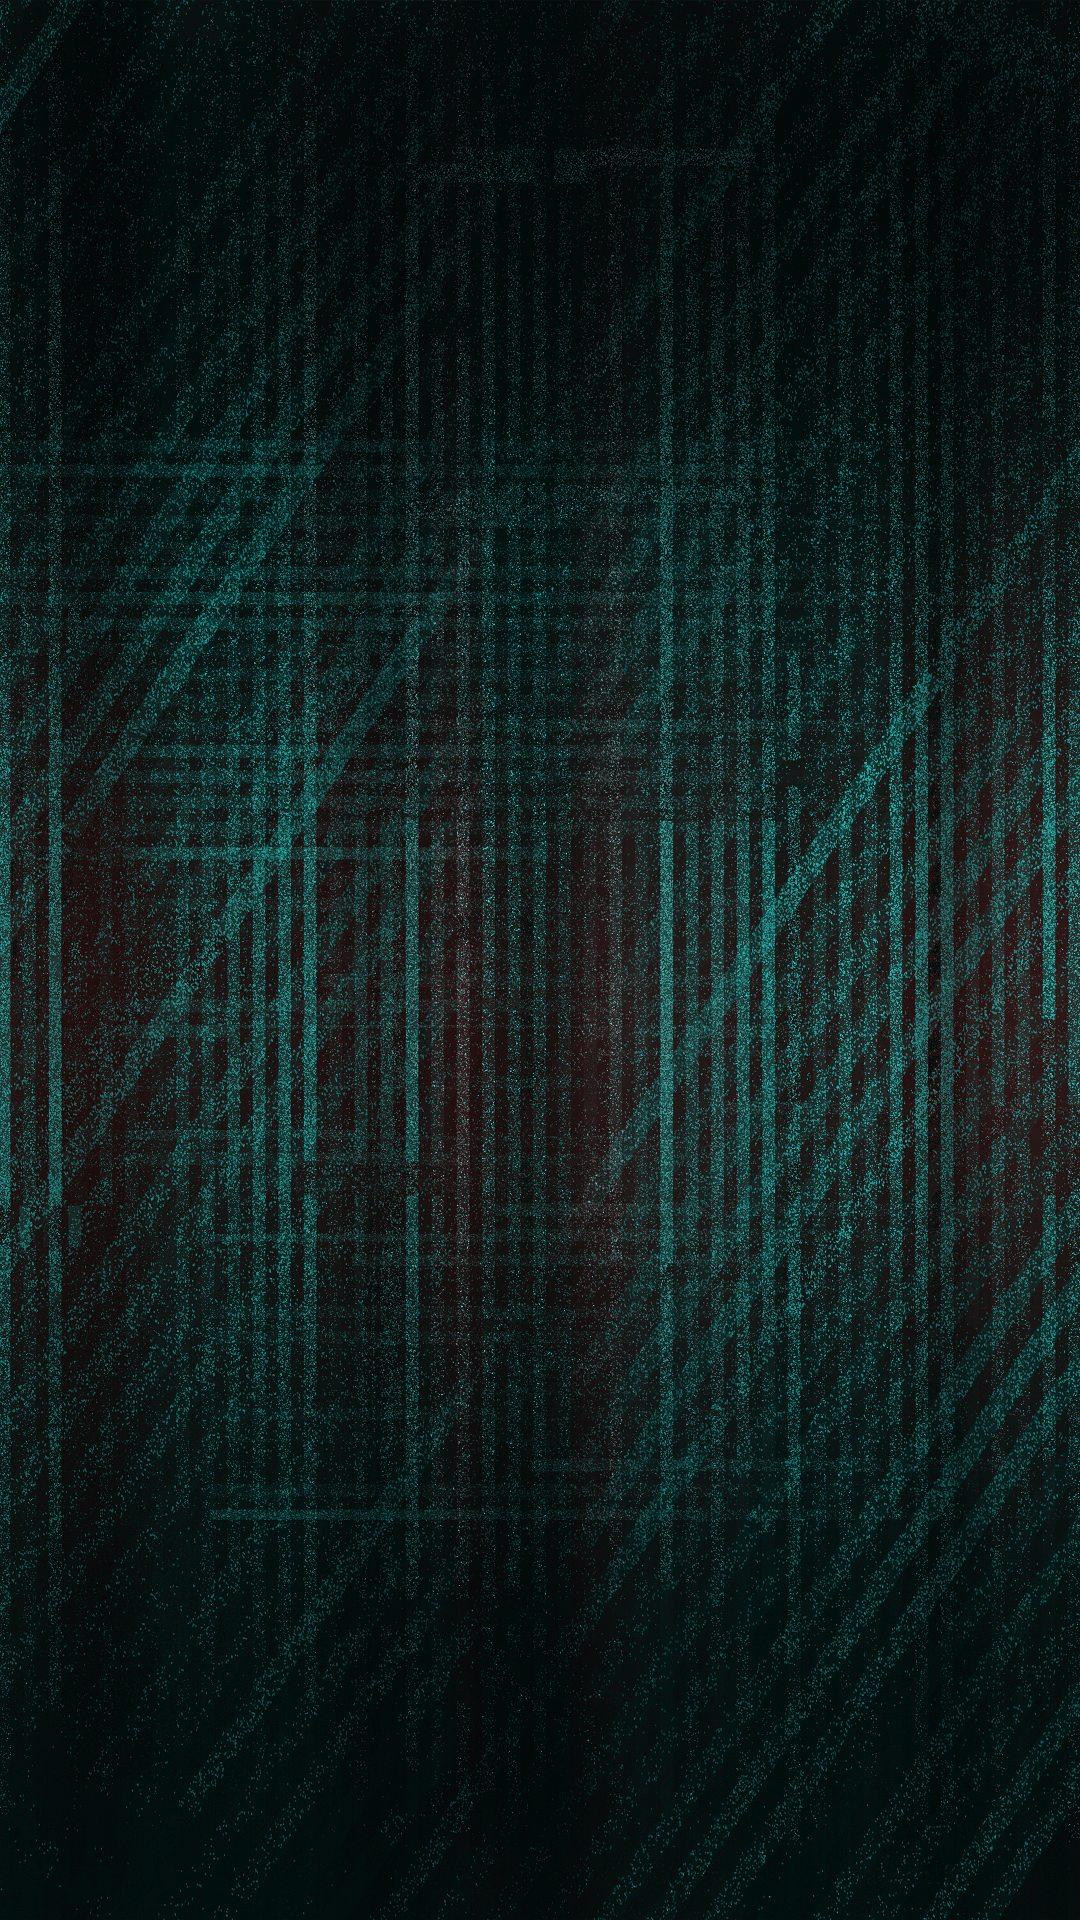 Dark Green Iphone6 Wallpaper Iphone Wallpaper